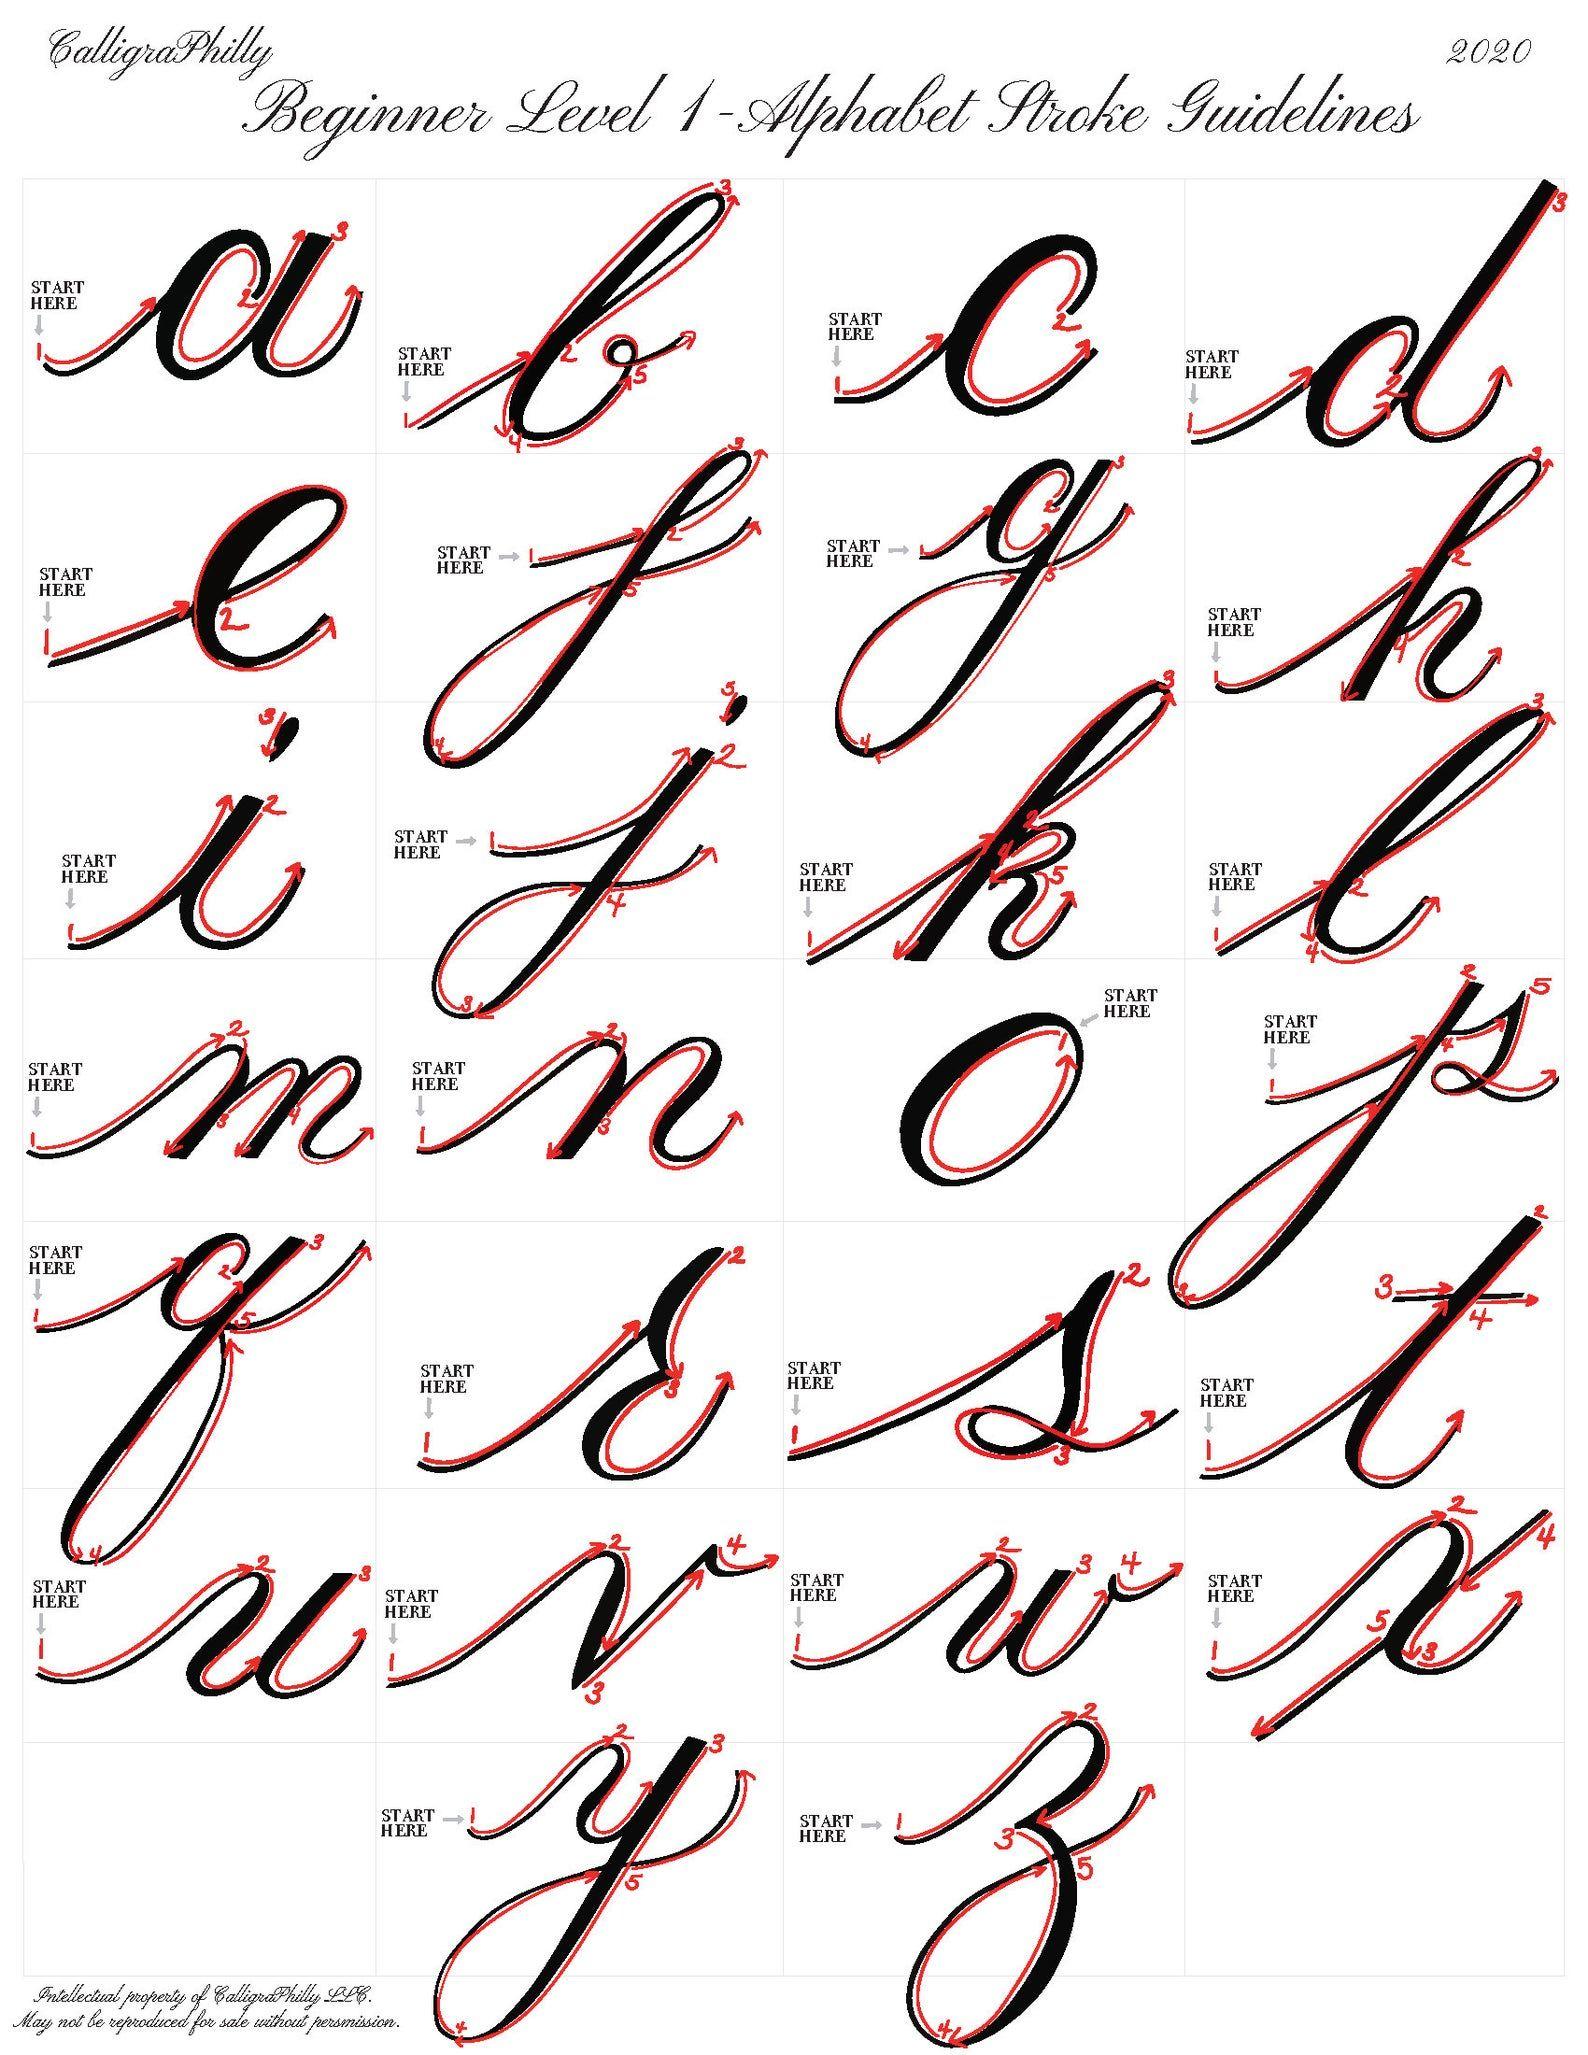 Beginner Level 1 Copperplate Calligraphy Alphabet